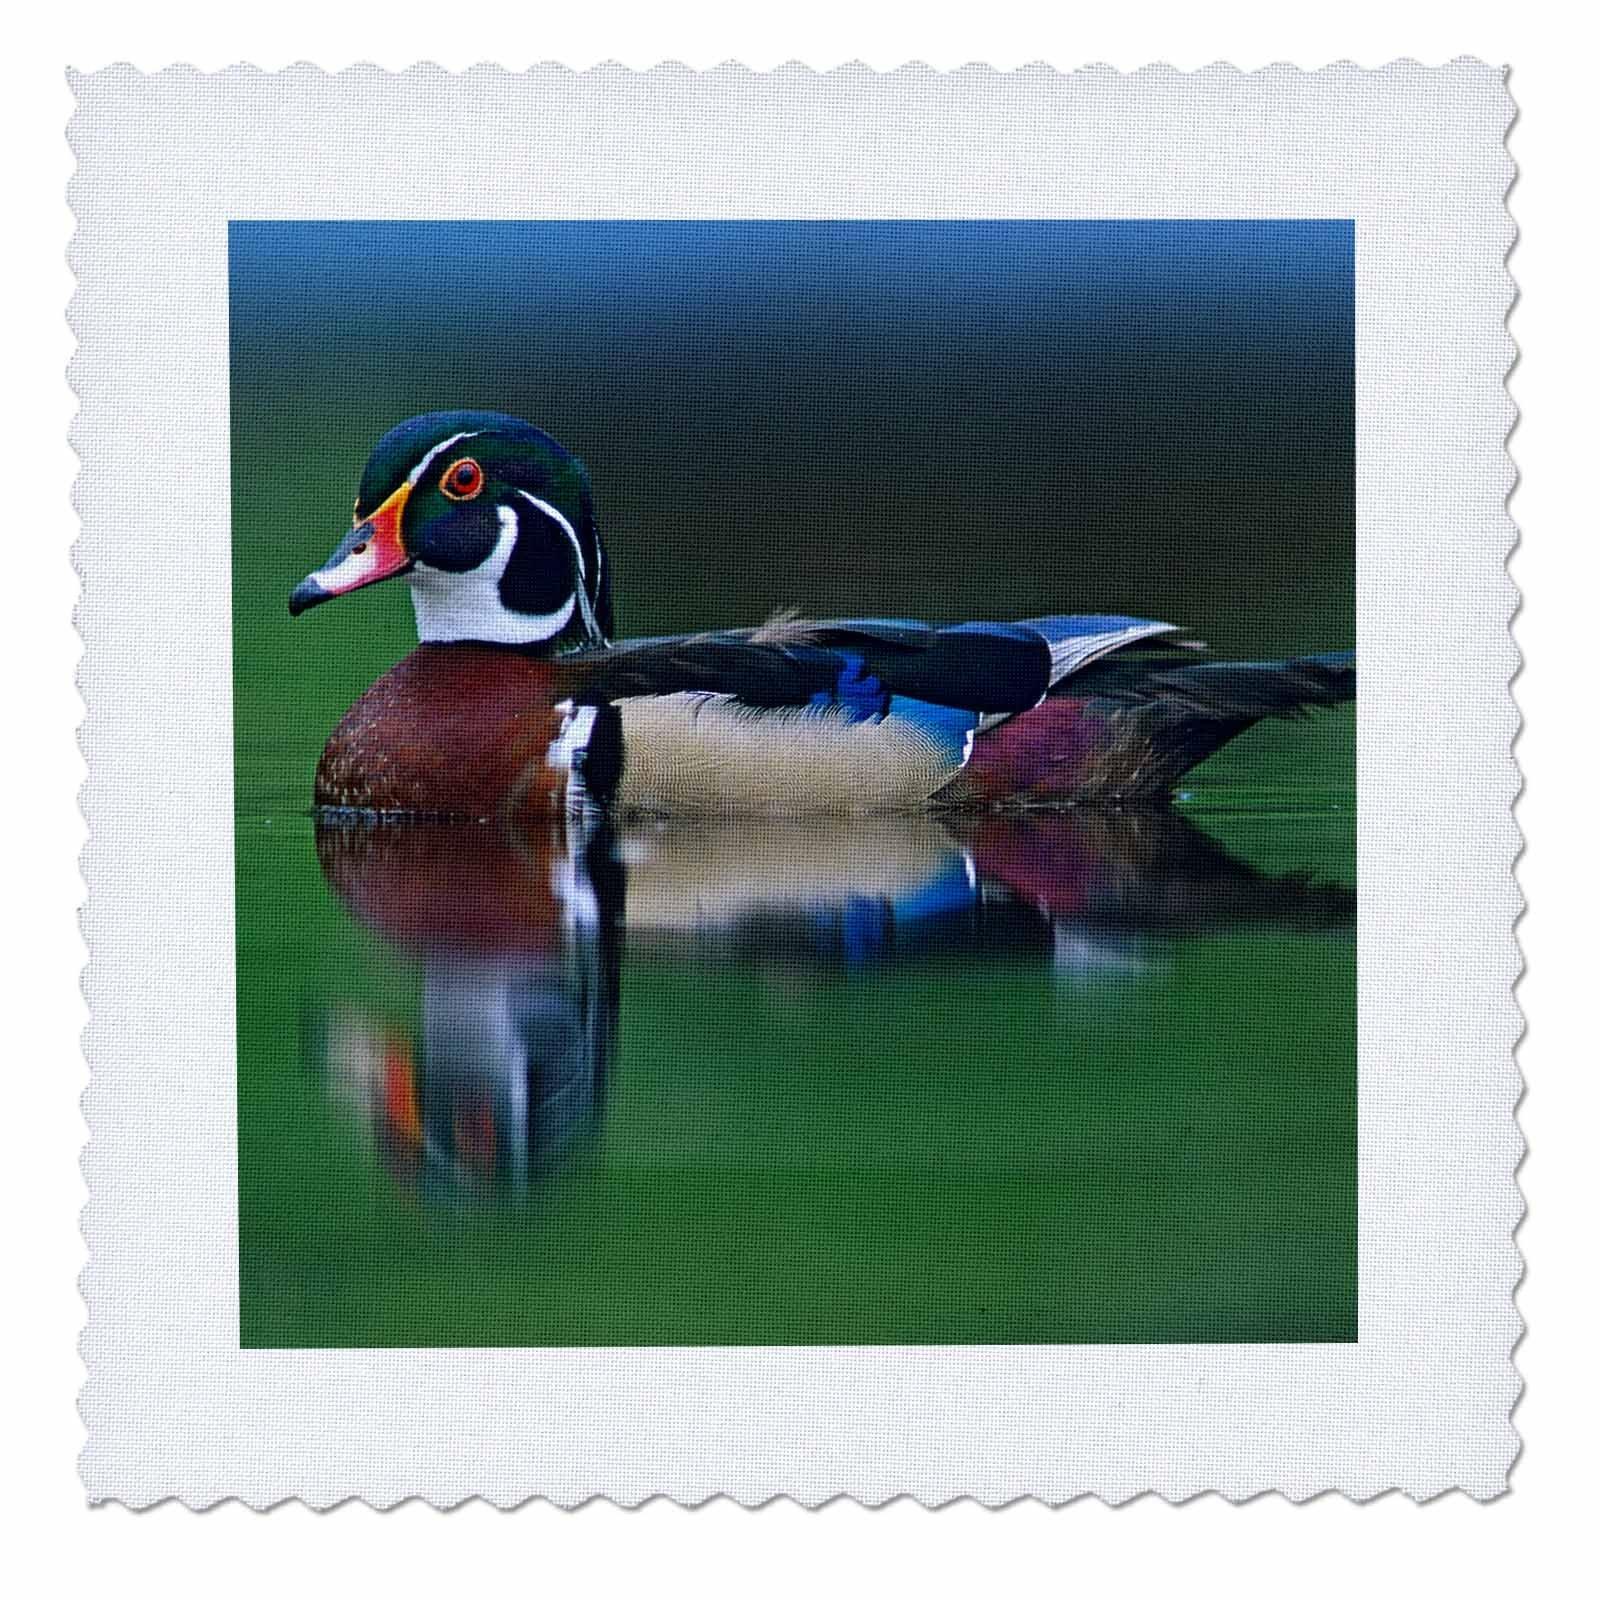 3dRose Danita Delimont - Ducks - Male wood duck, Aix sponsa, swimming, Canada - 22x22 inch quilt square (qs_258088_9)